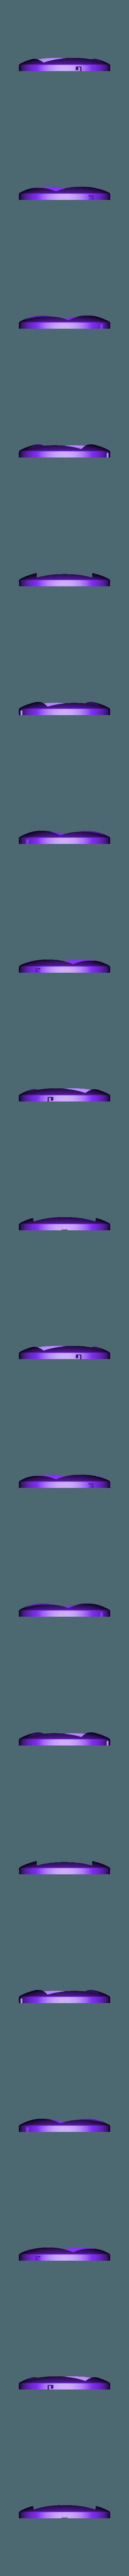 sinar tripod mount (v1.6) base.stl Download STL file Sinar rail clamp (camera/tripod support) & F1 repairs • 3D printing object, vintage-lens